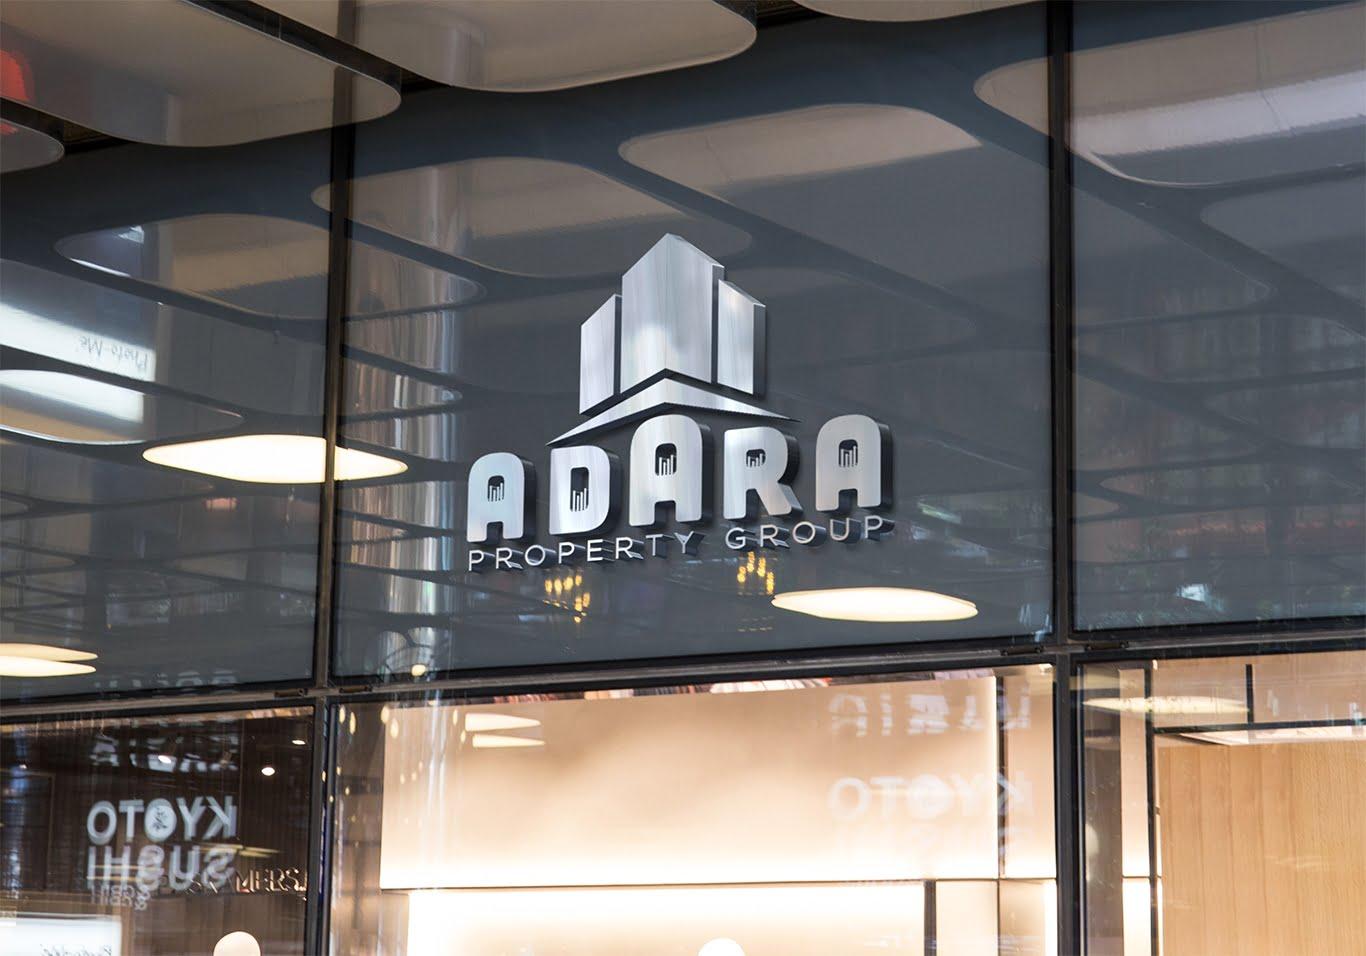 Adara Property Group